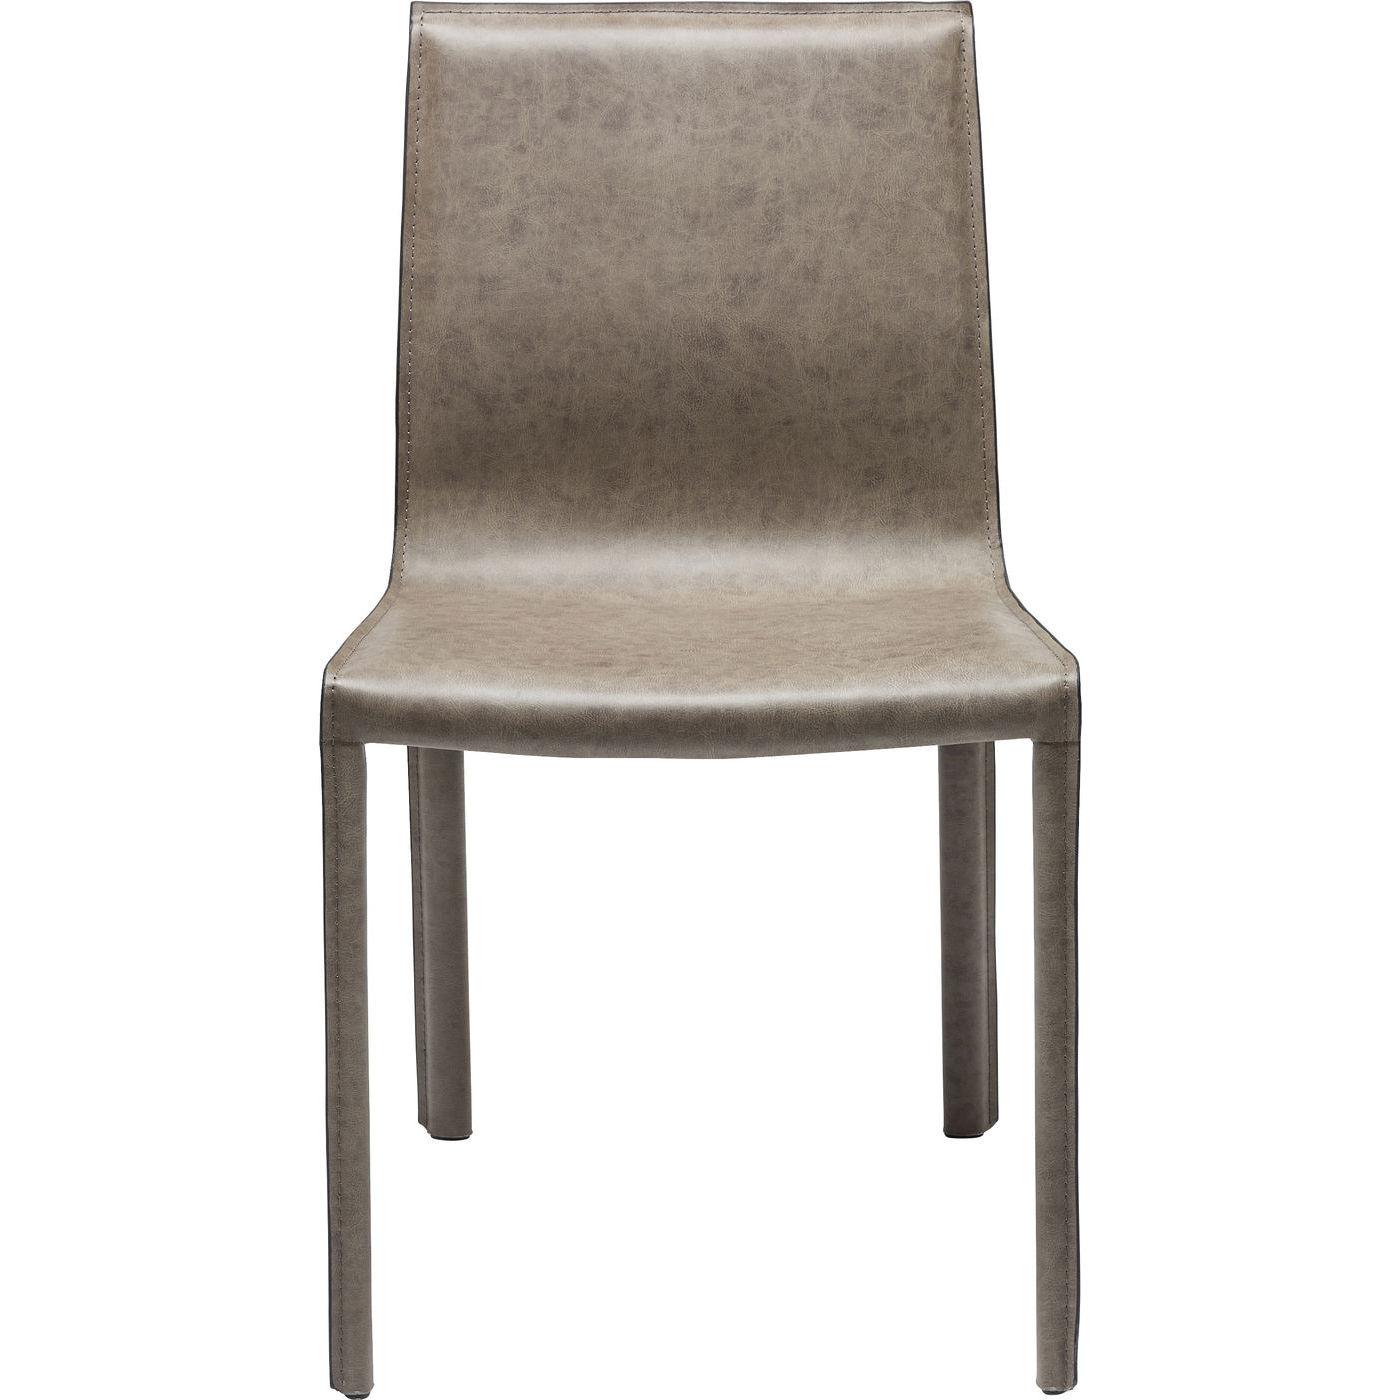 Image of   Kare Design Spisebordsstol, Fino Grey-Green